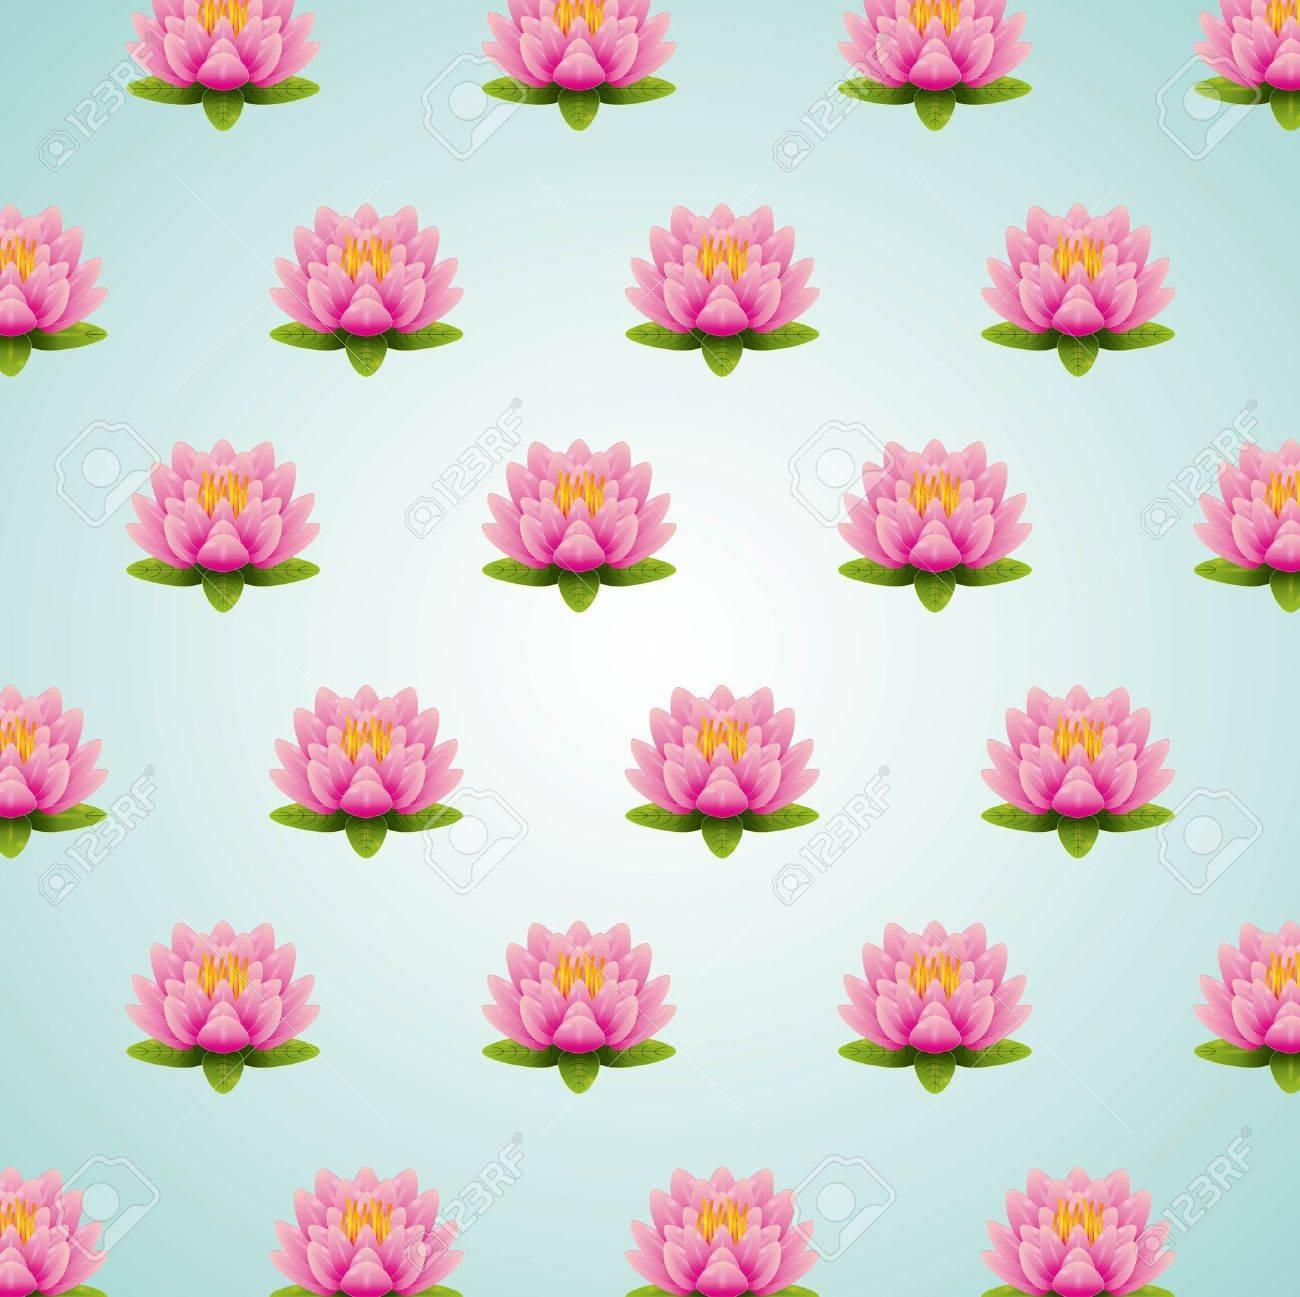 Lotus flower design vector illustration graphic royalty free lotus flower design vector illustration graphic stock vector 45094298 izmirmasajfo